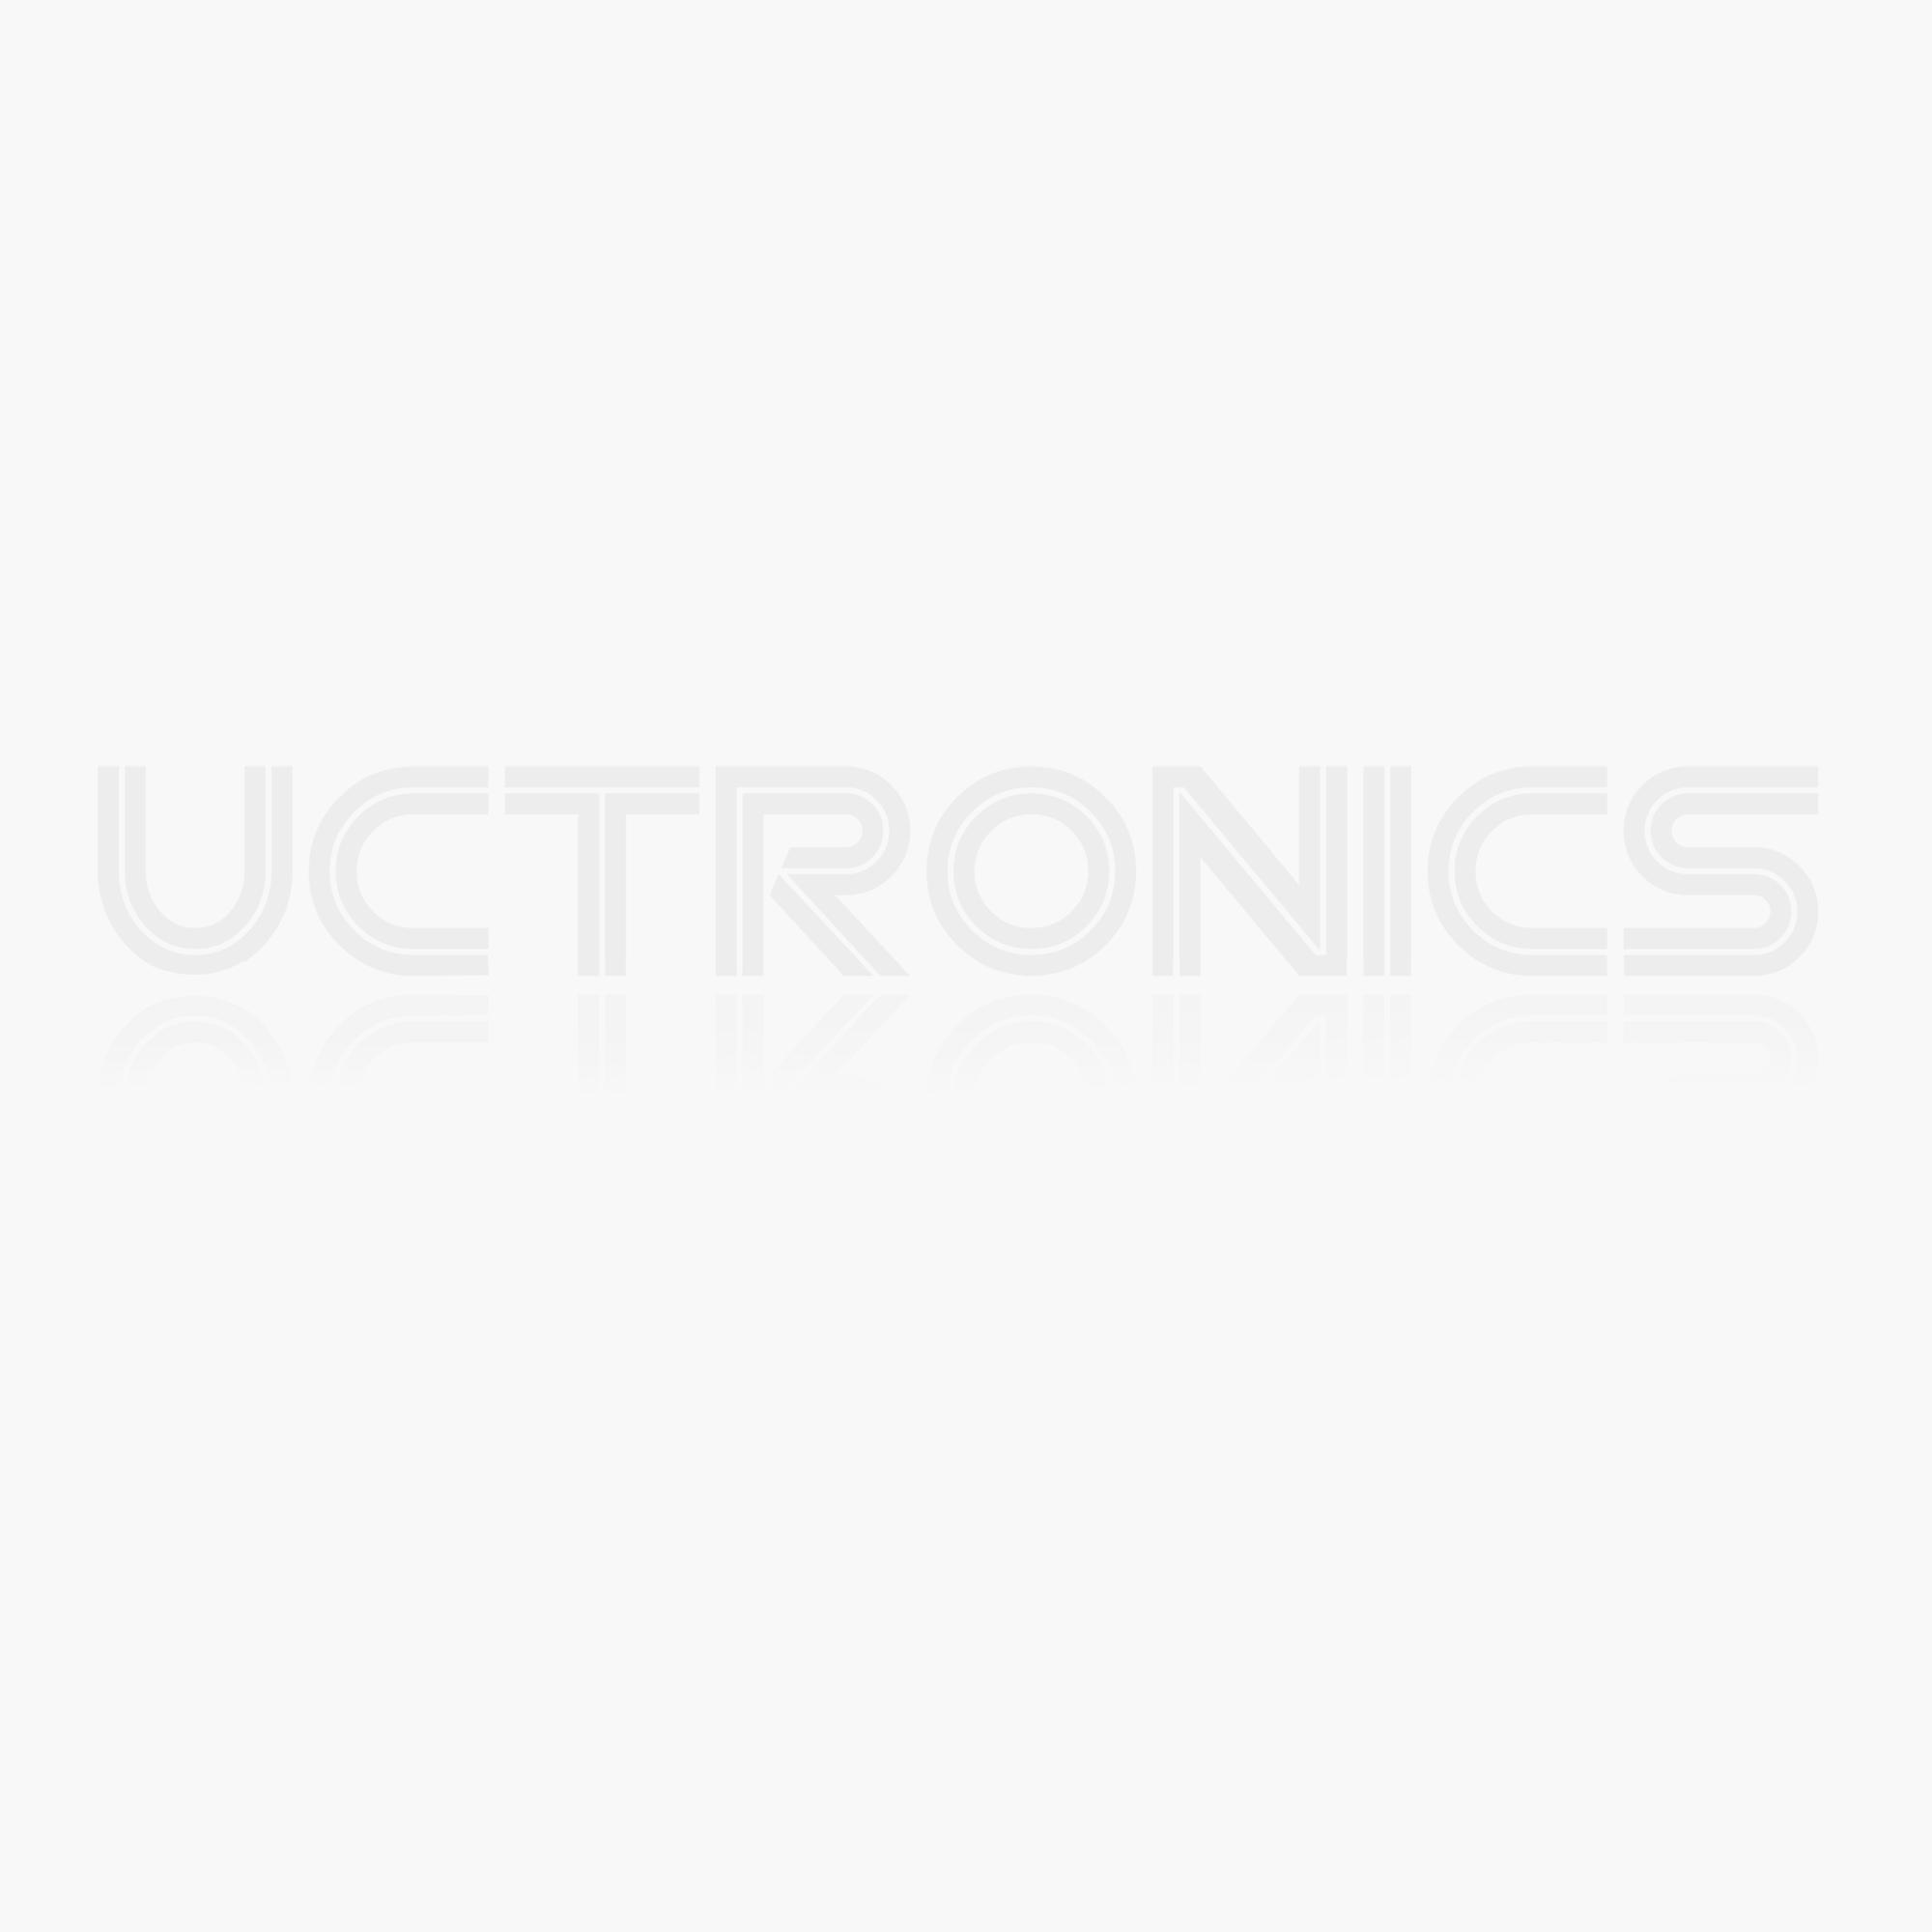 GY-30 BH1750FVI intensity Digital Light Sensor Module For Arduino